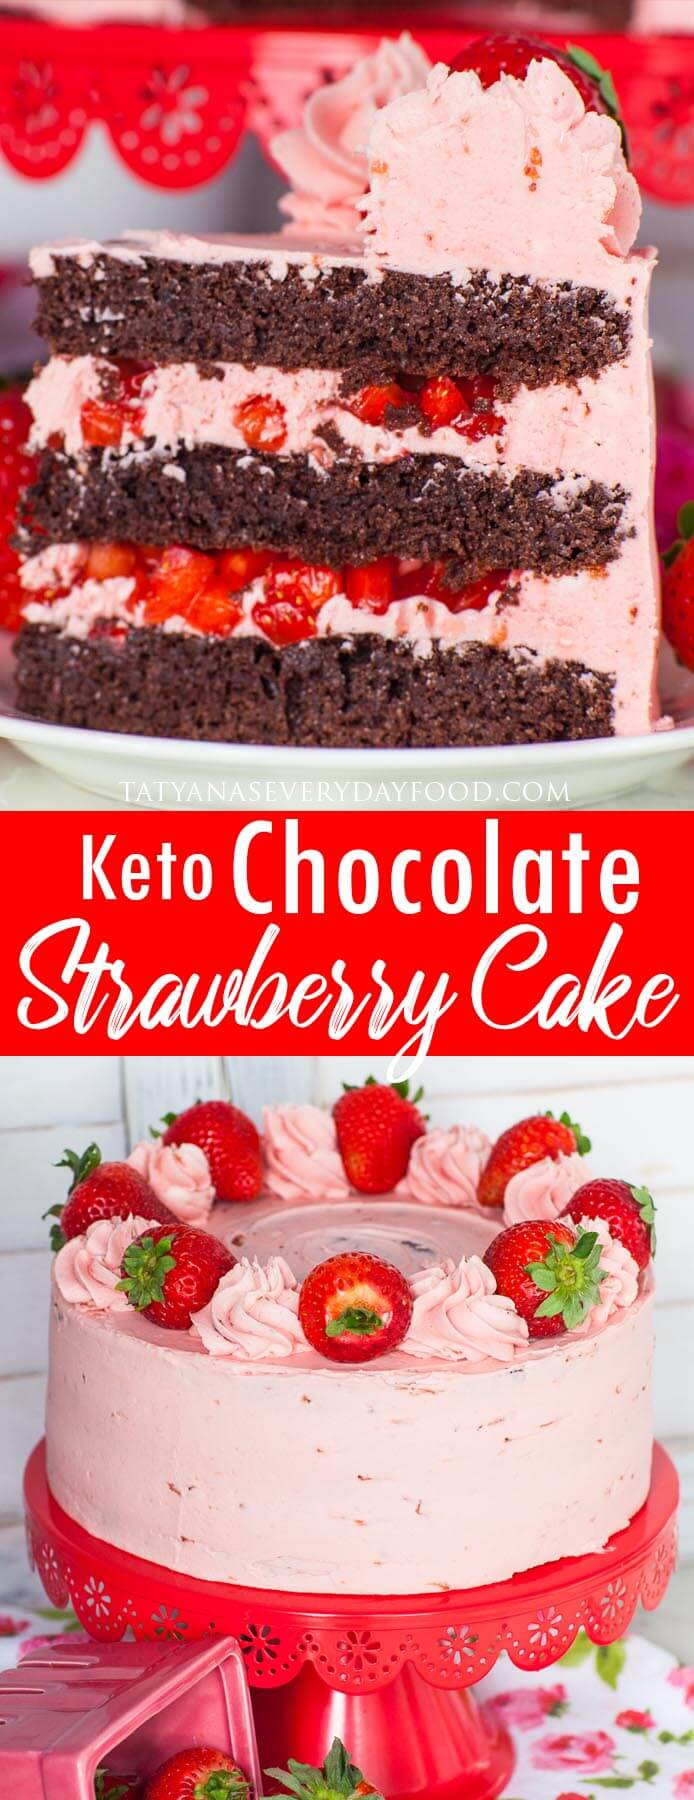 Keto Chocolate Strawberry Cake video recipe